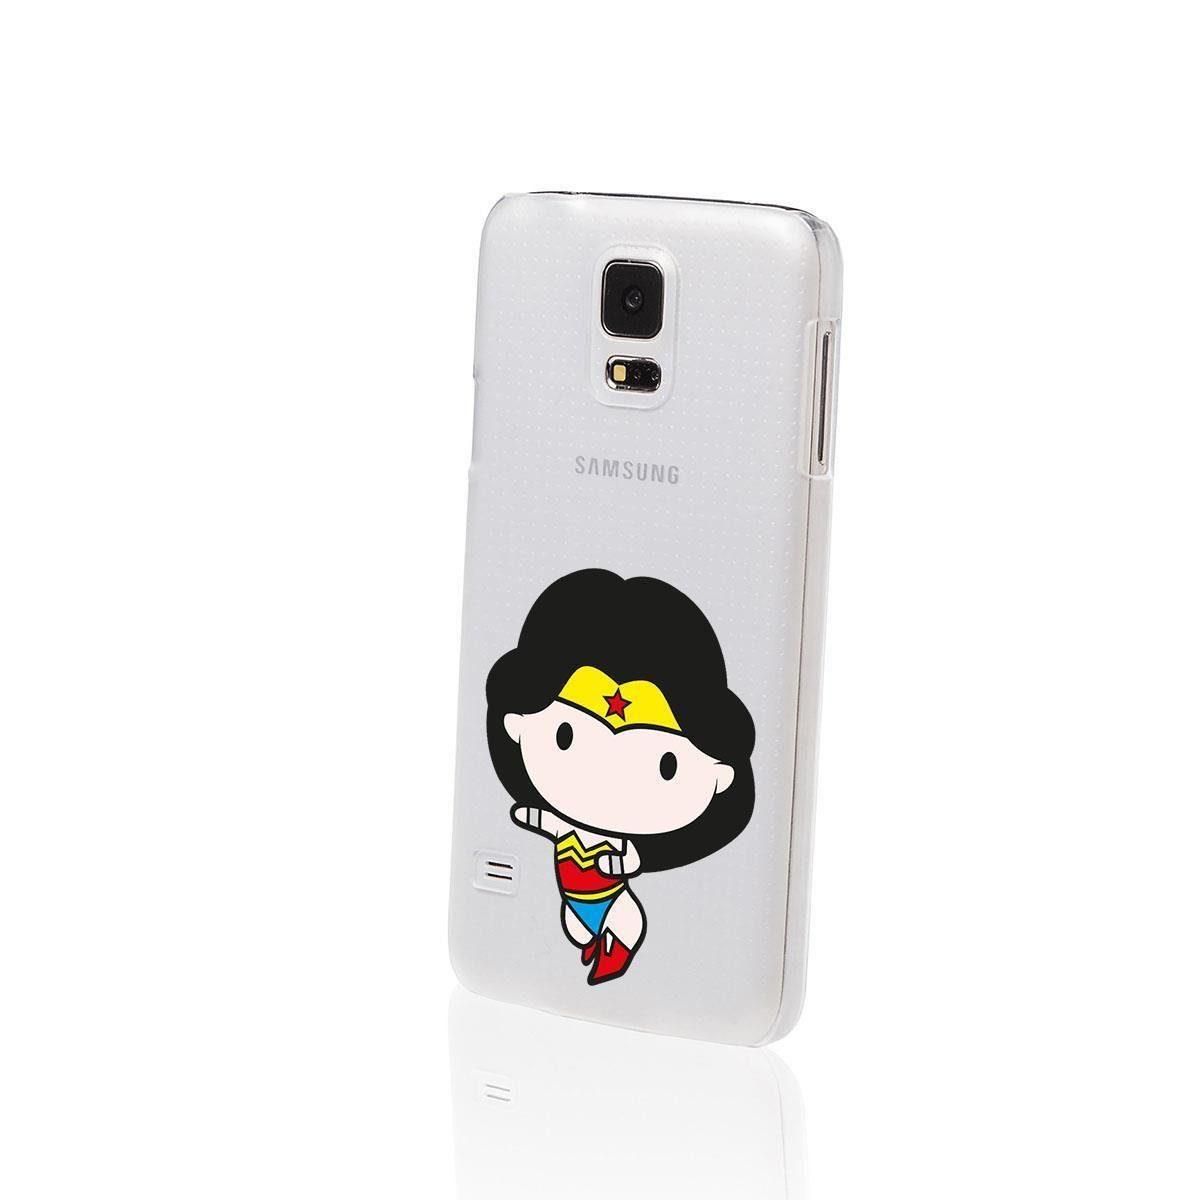 Finoo Smartphone-Hülle Samsung Galaxy S5 Neo